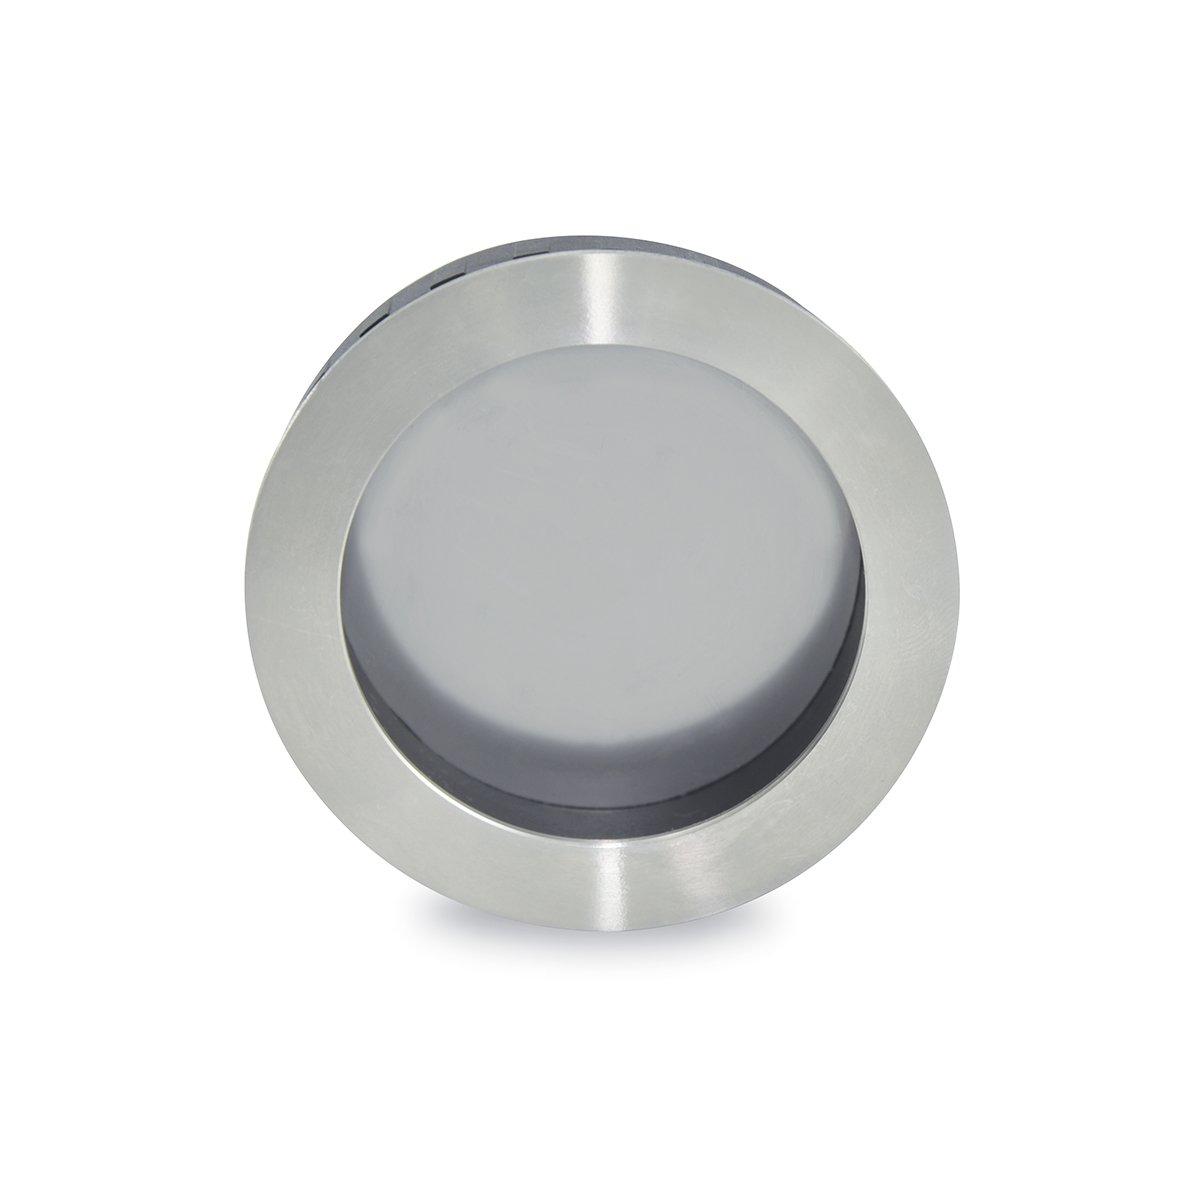 Jako WFH111X75PSS Round Flush Pull - Polish Stainless Steel, Diameter 2 61/64''